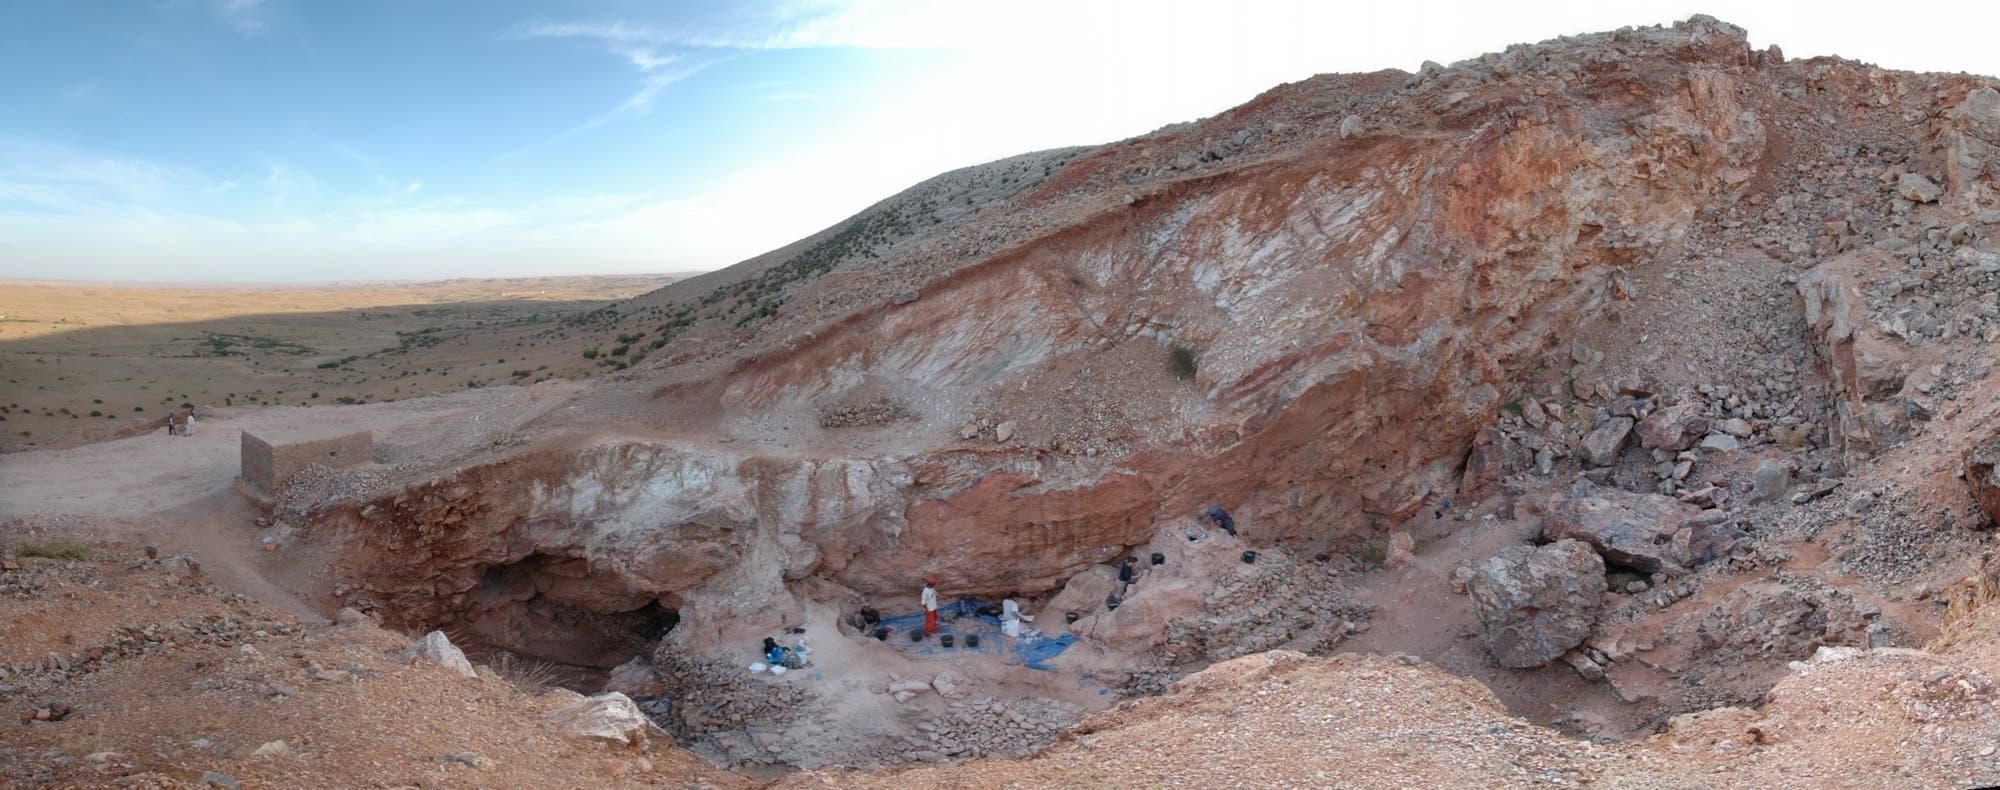 Ausgrabungen in Jebel Irhoud